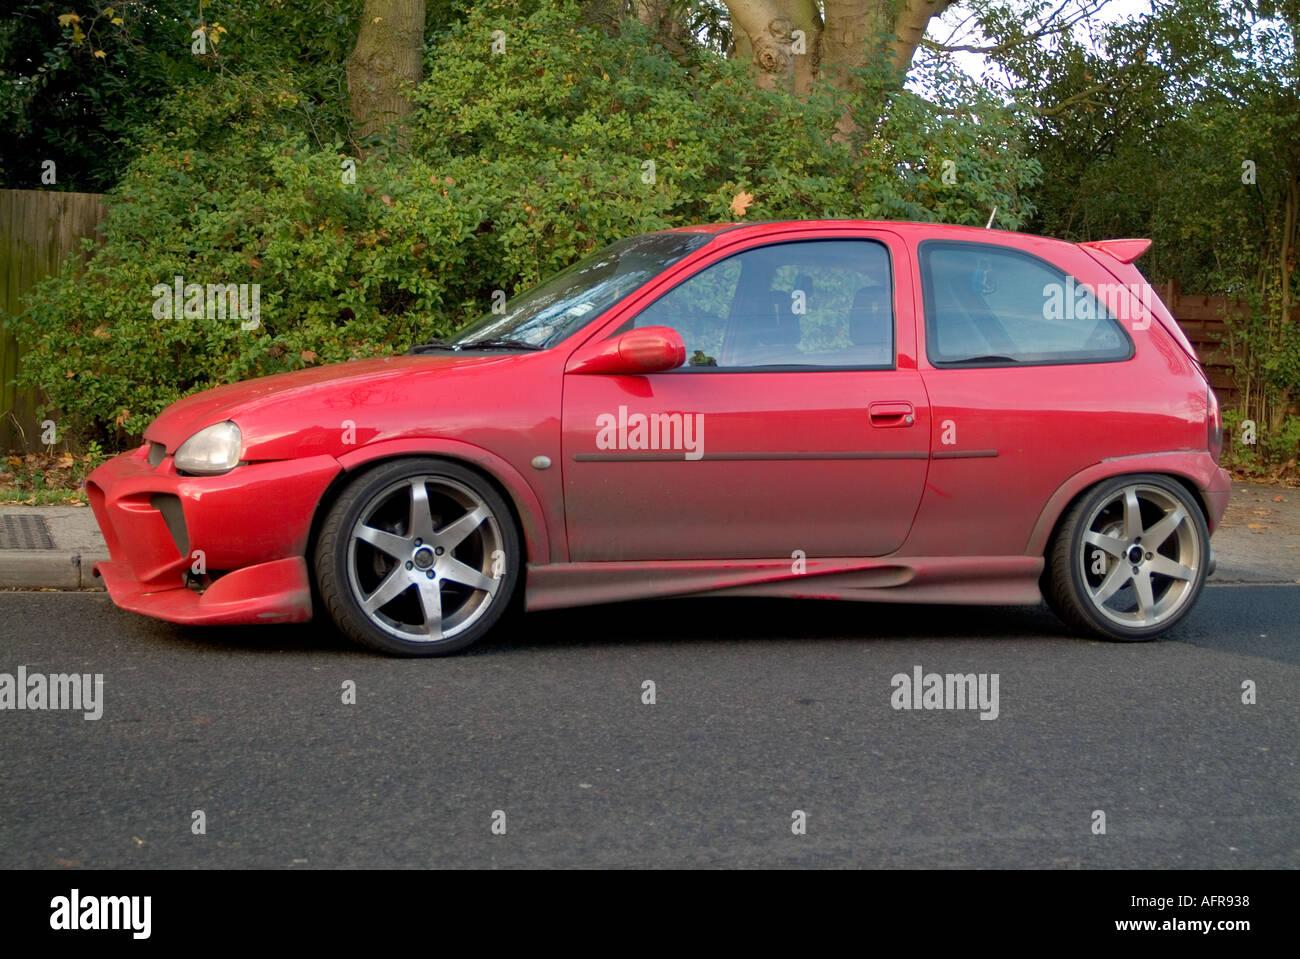 Boy Racer Vauxhall Corsa Max Power Plastic Body Kit Car Modification